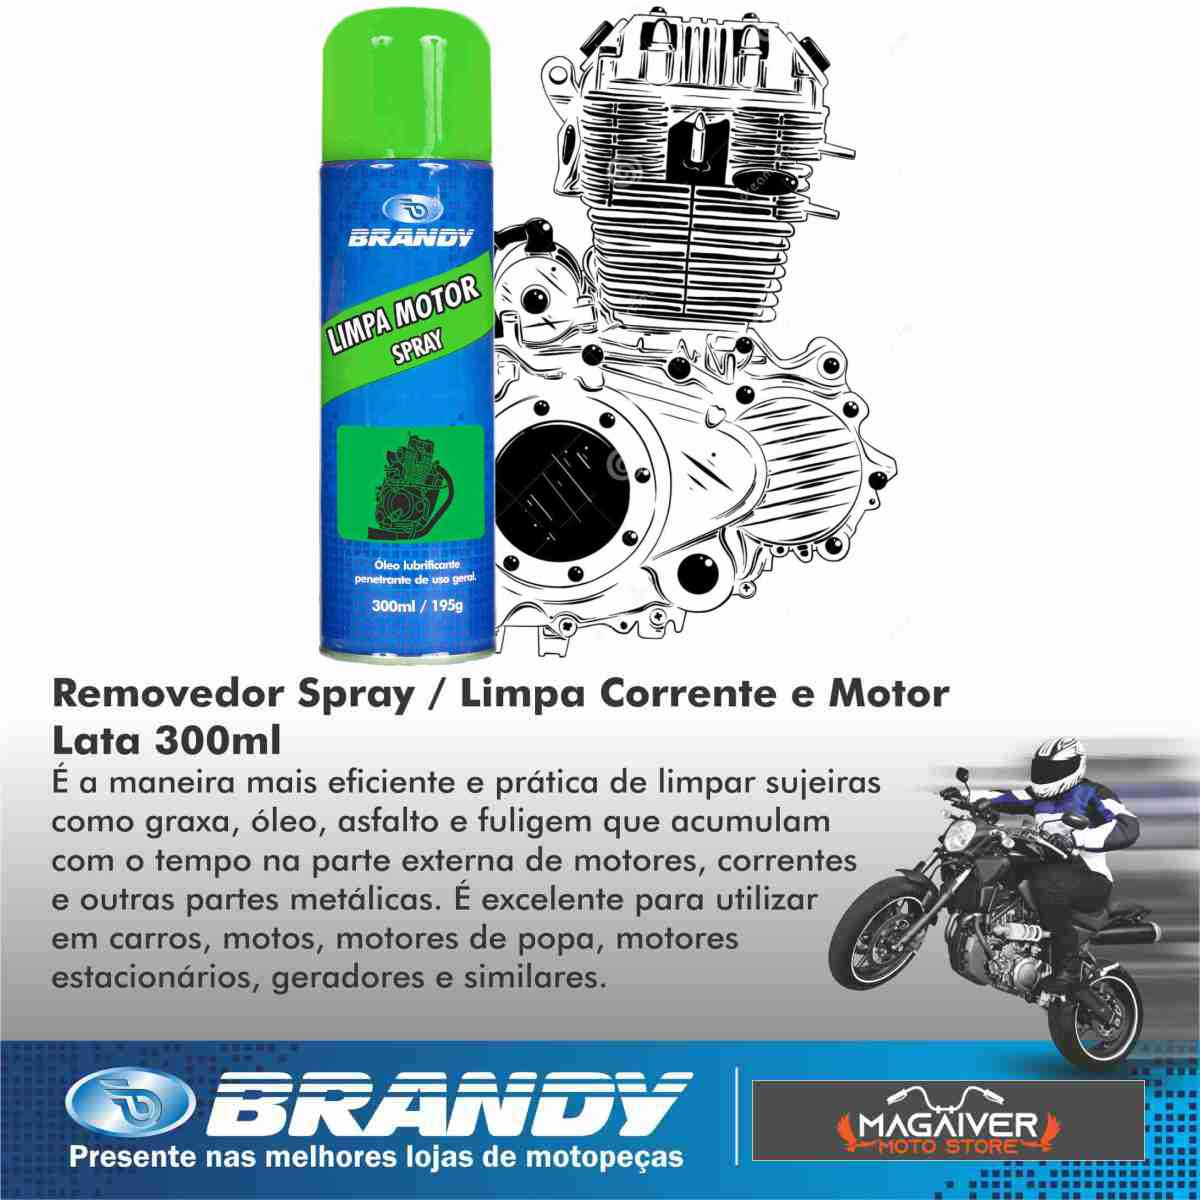 KIT 2 GRAXA ADESIVA MOTO SPRAY BRANDY ALTA PERFORMANCE + 1 REMOVEDOR LIMPA CORRENTE E MOTOR 300ml